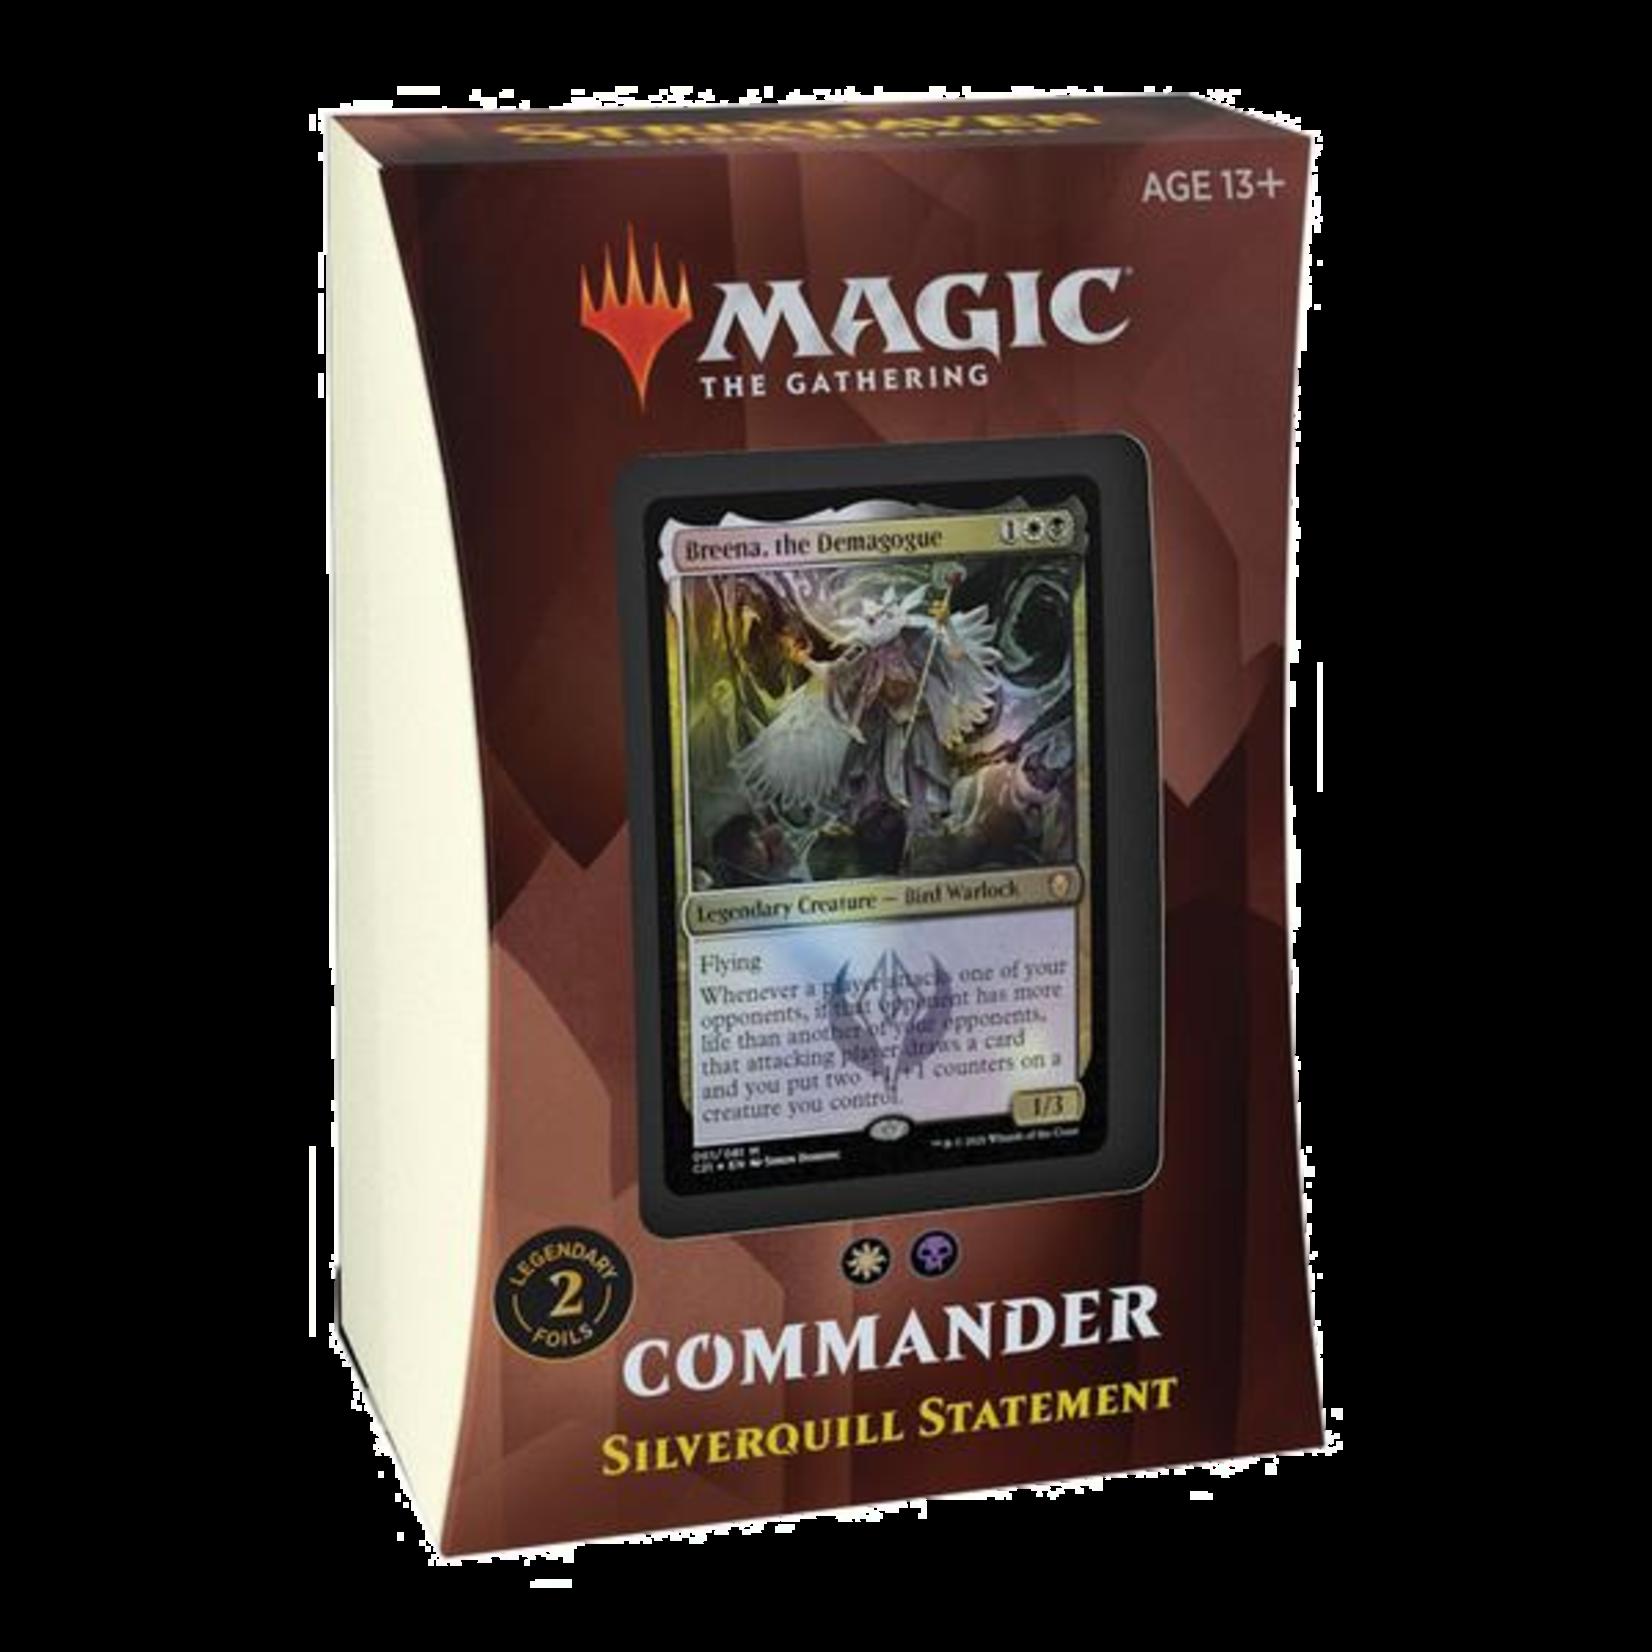 Wizards of the Coast MTG: Strixhaven Commander